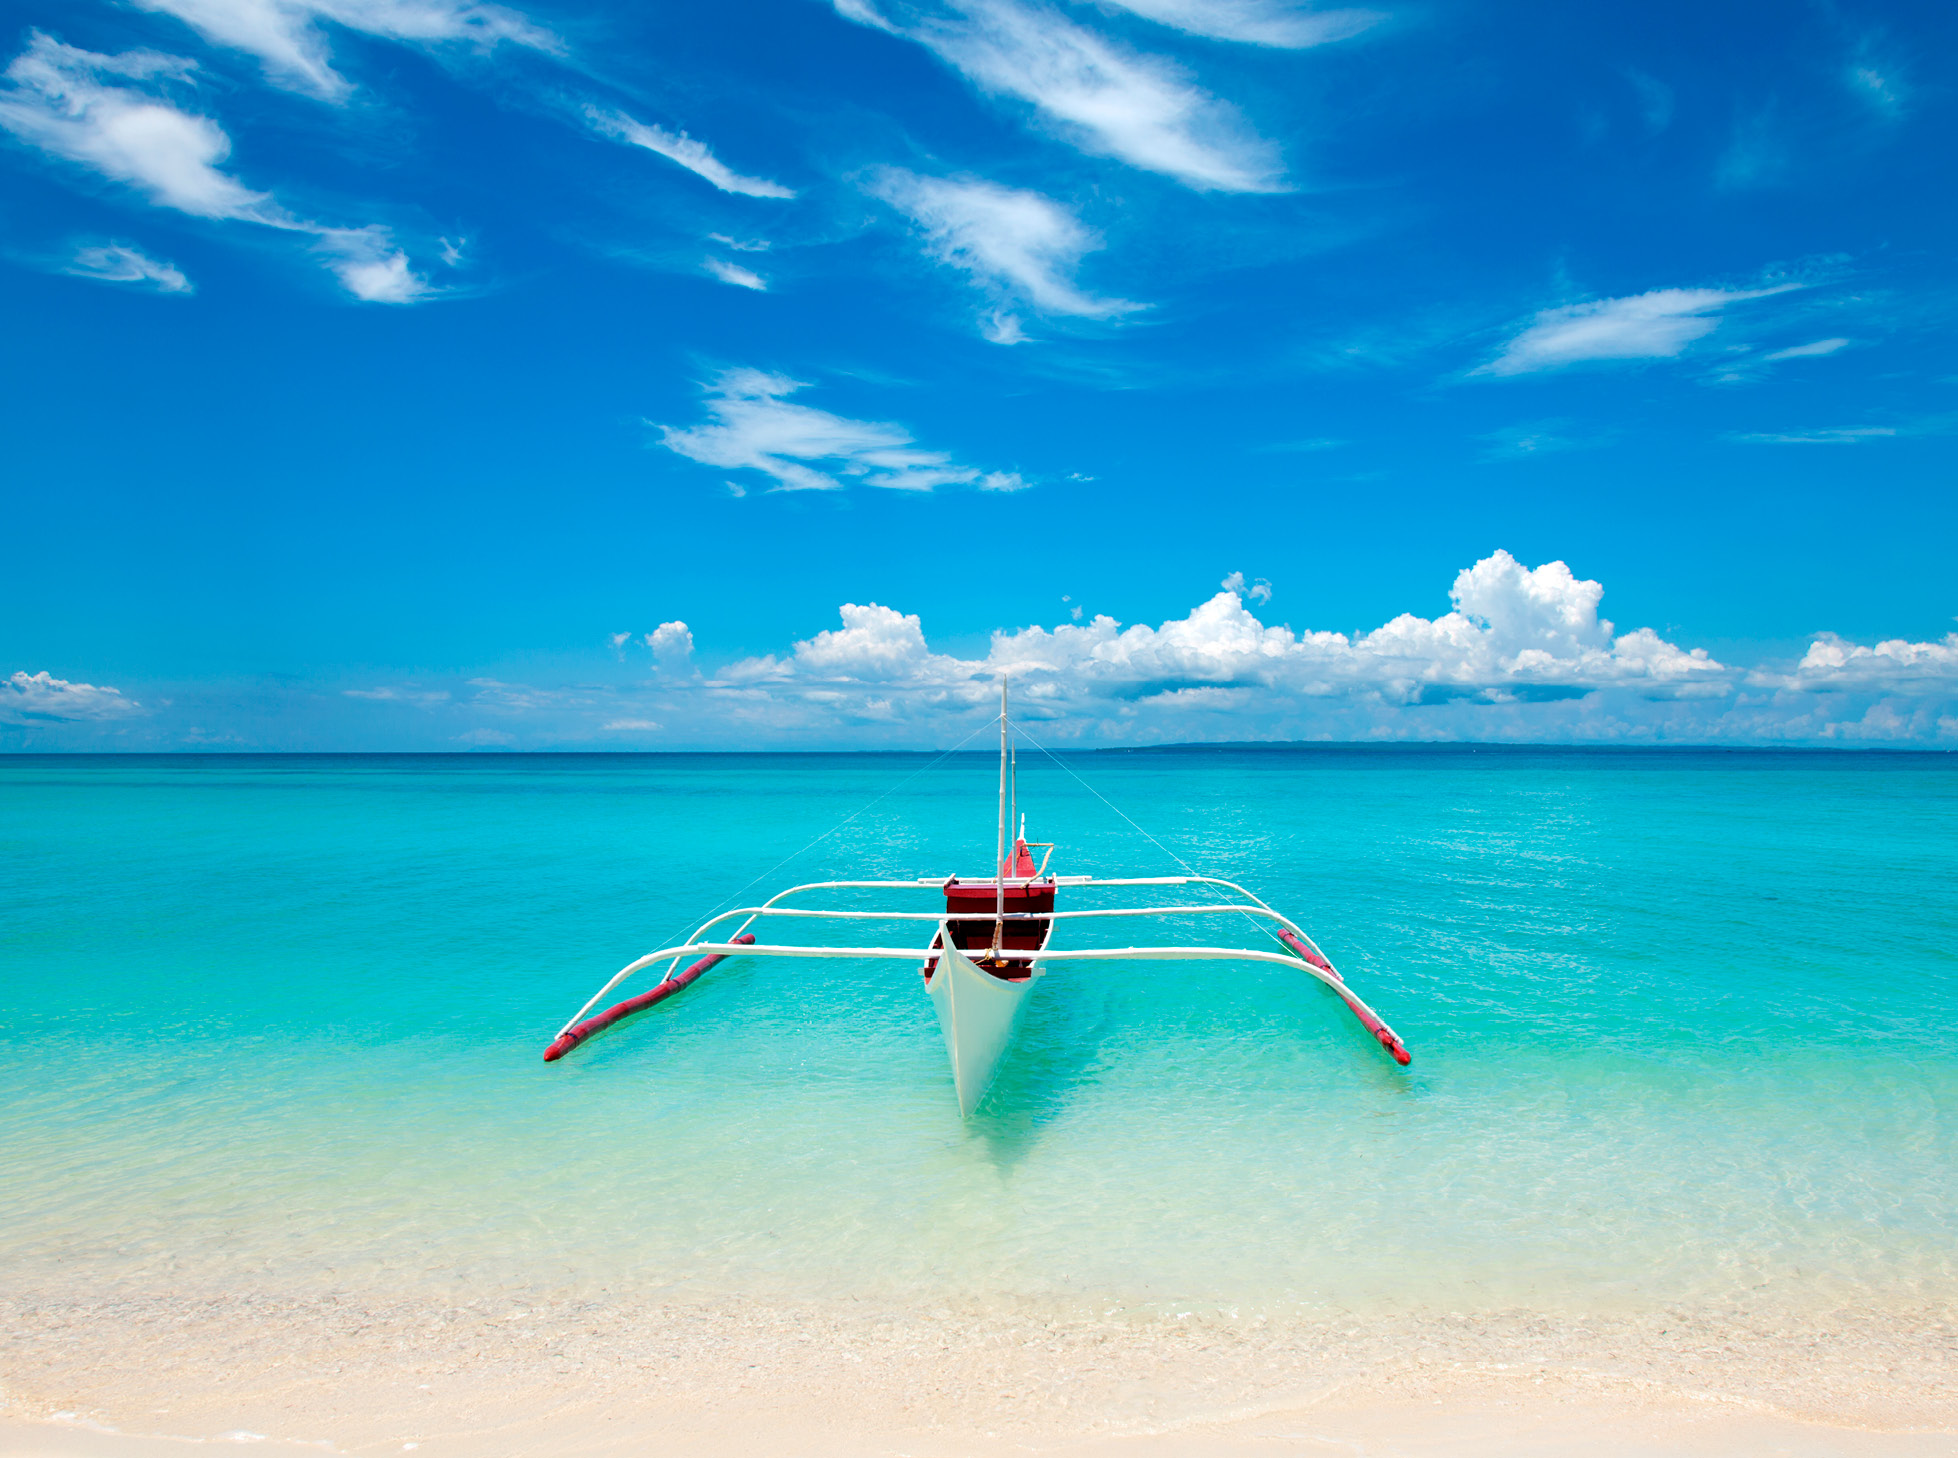 Cebu beach holiday in the philipinnes